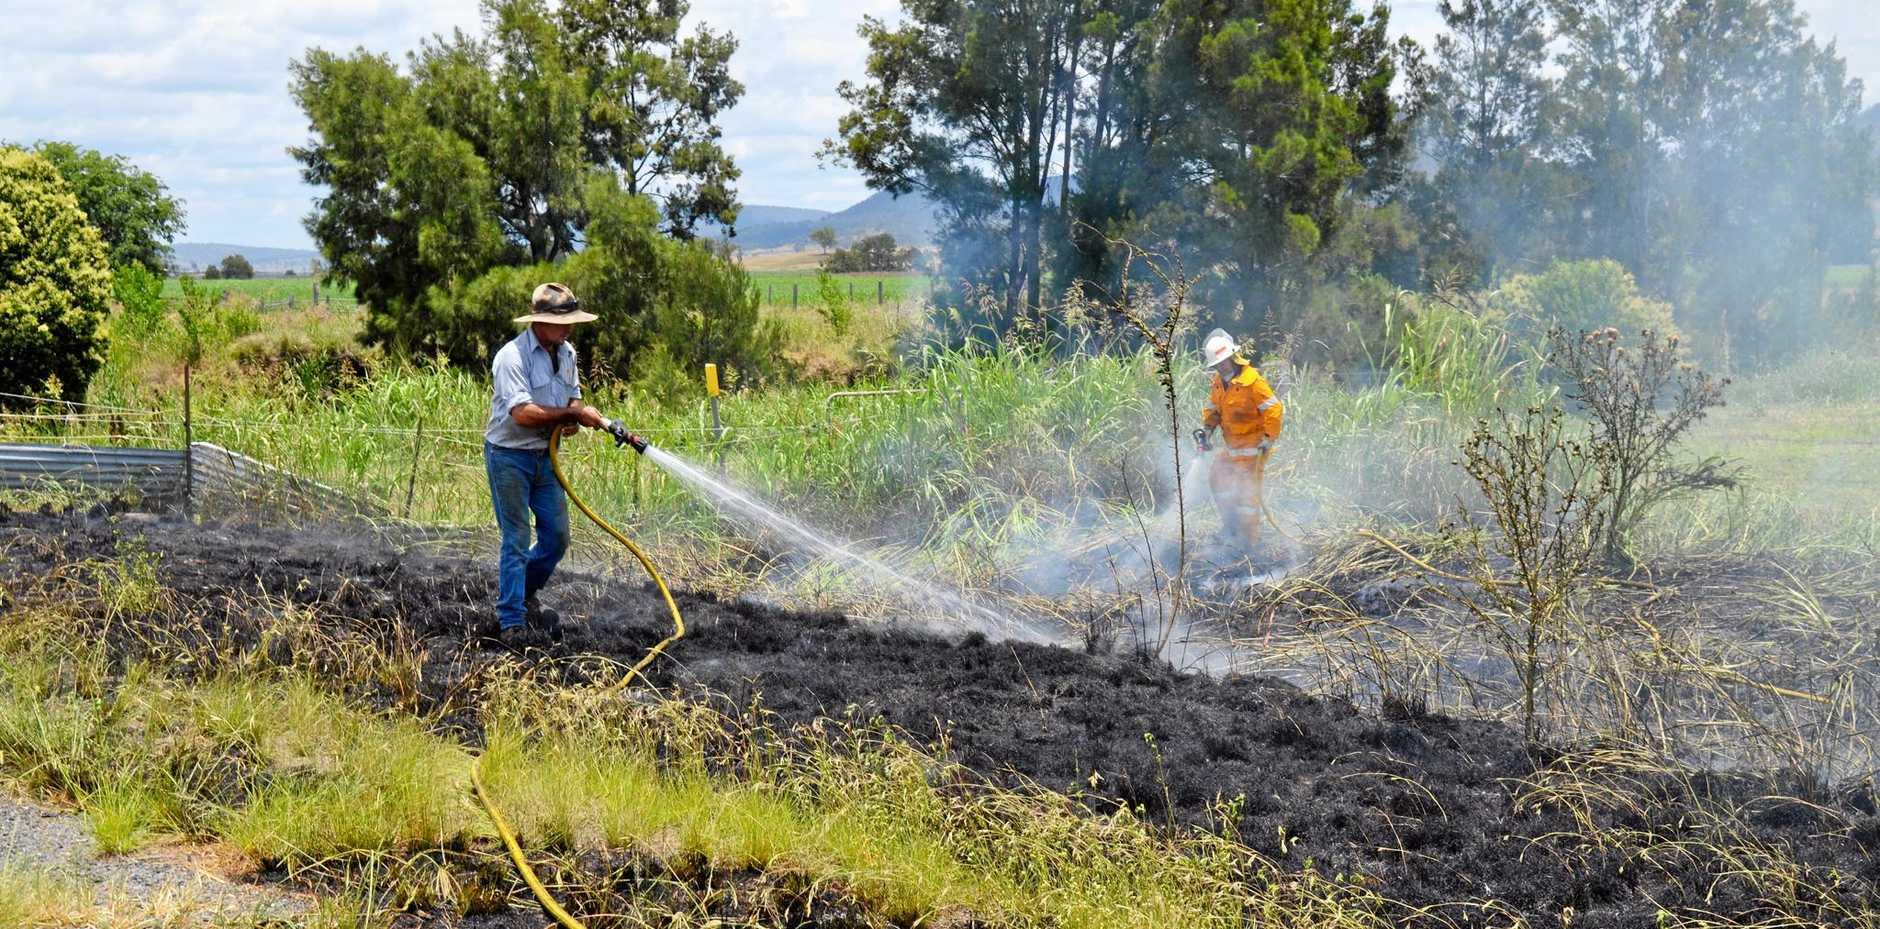 FIRE HAZARD: A damaged caravan wheel sparked fires on the Cunningham Hwy.